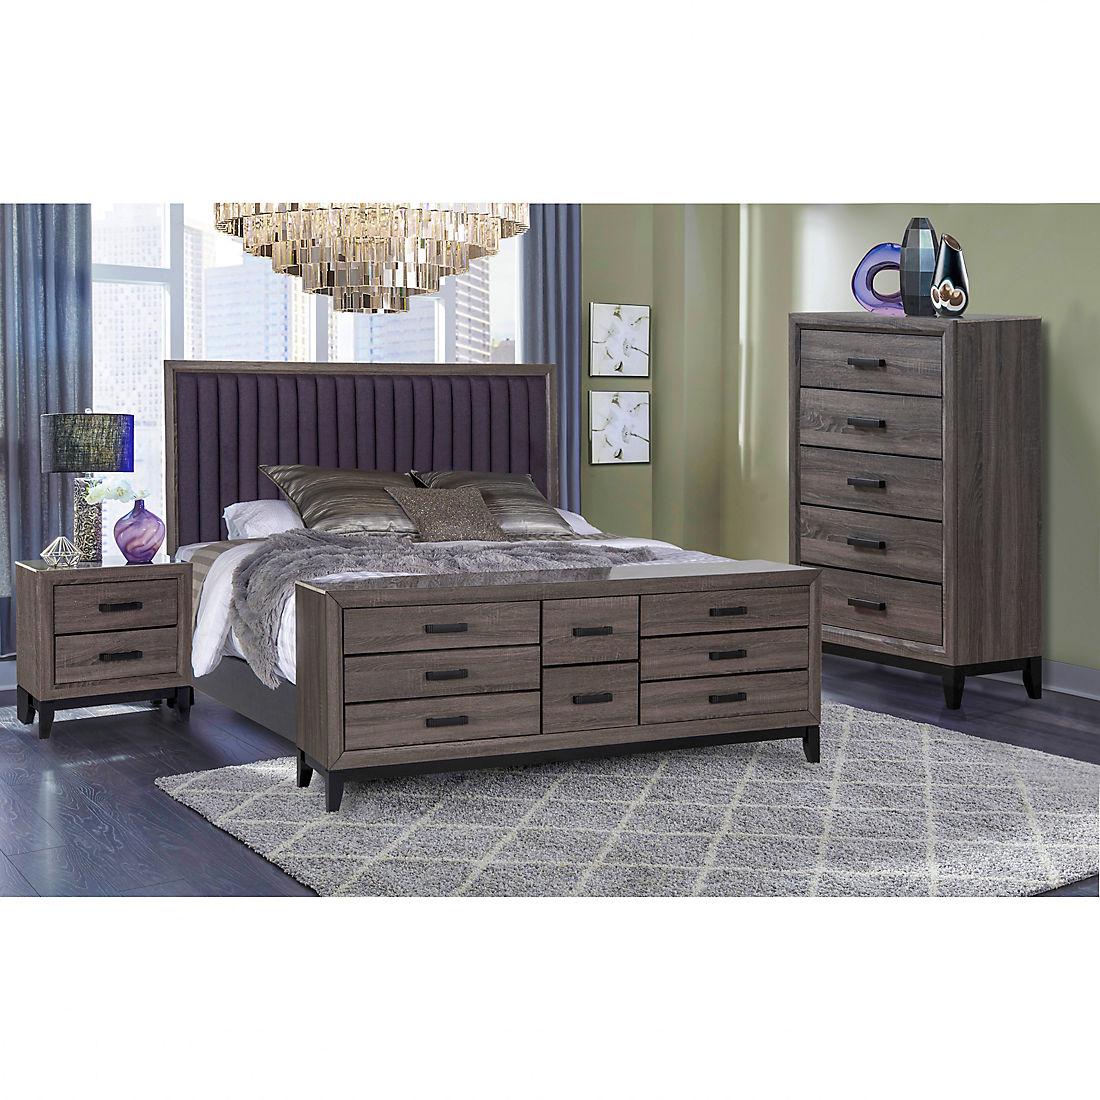 Laura 4 Pc Bedroom Set Beachwood Gray Bjs Wholesale Club